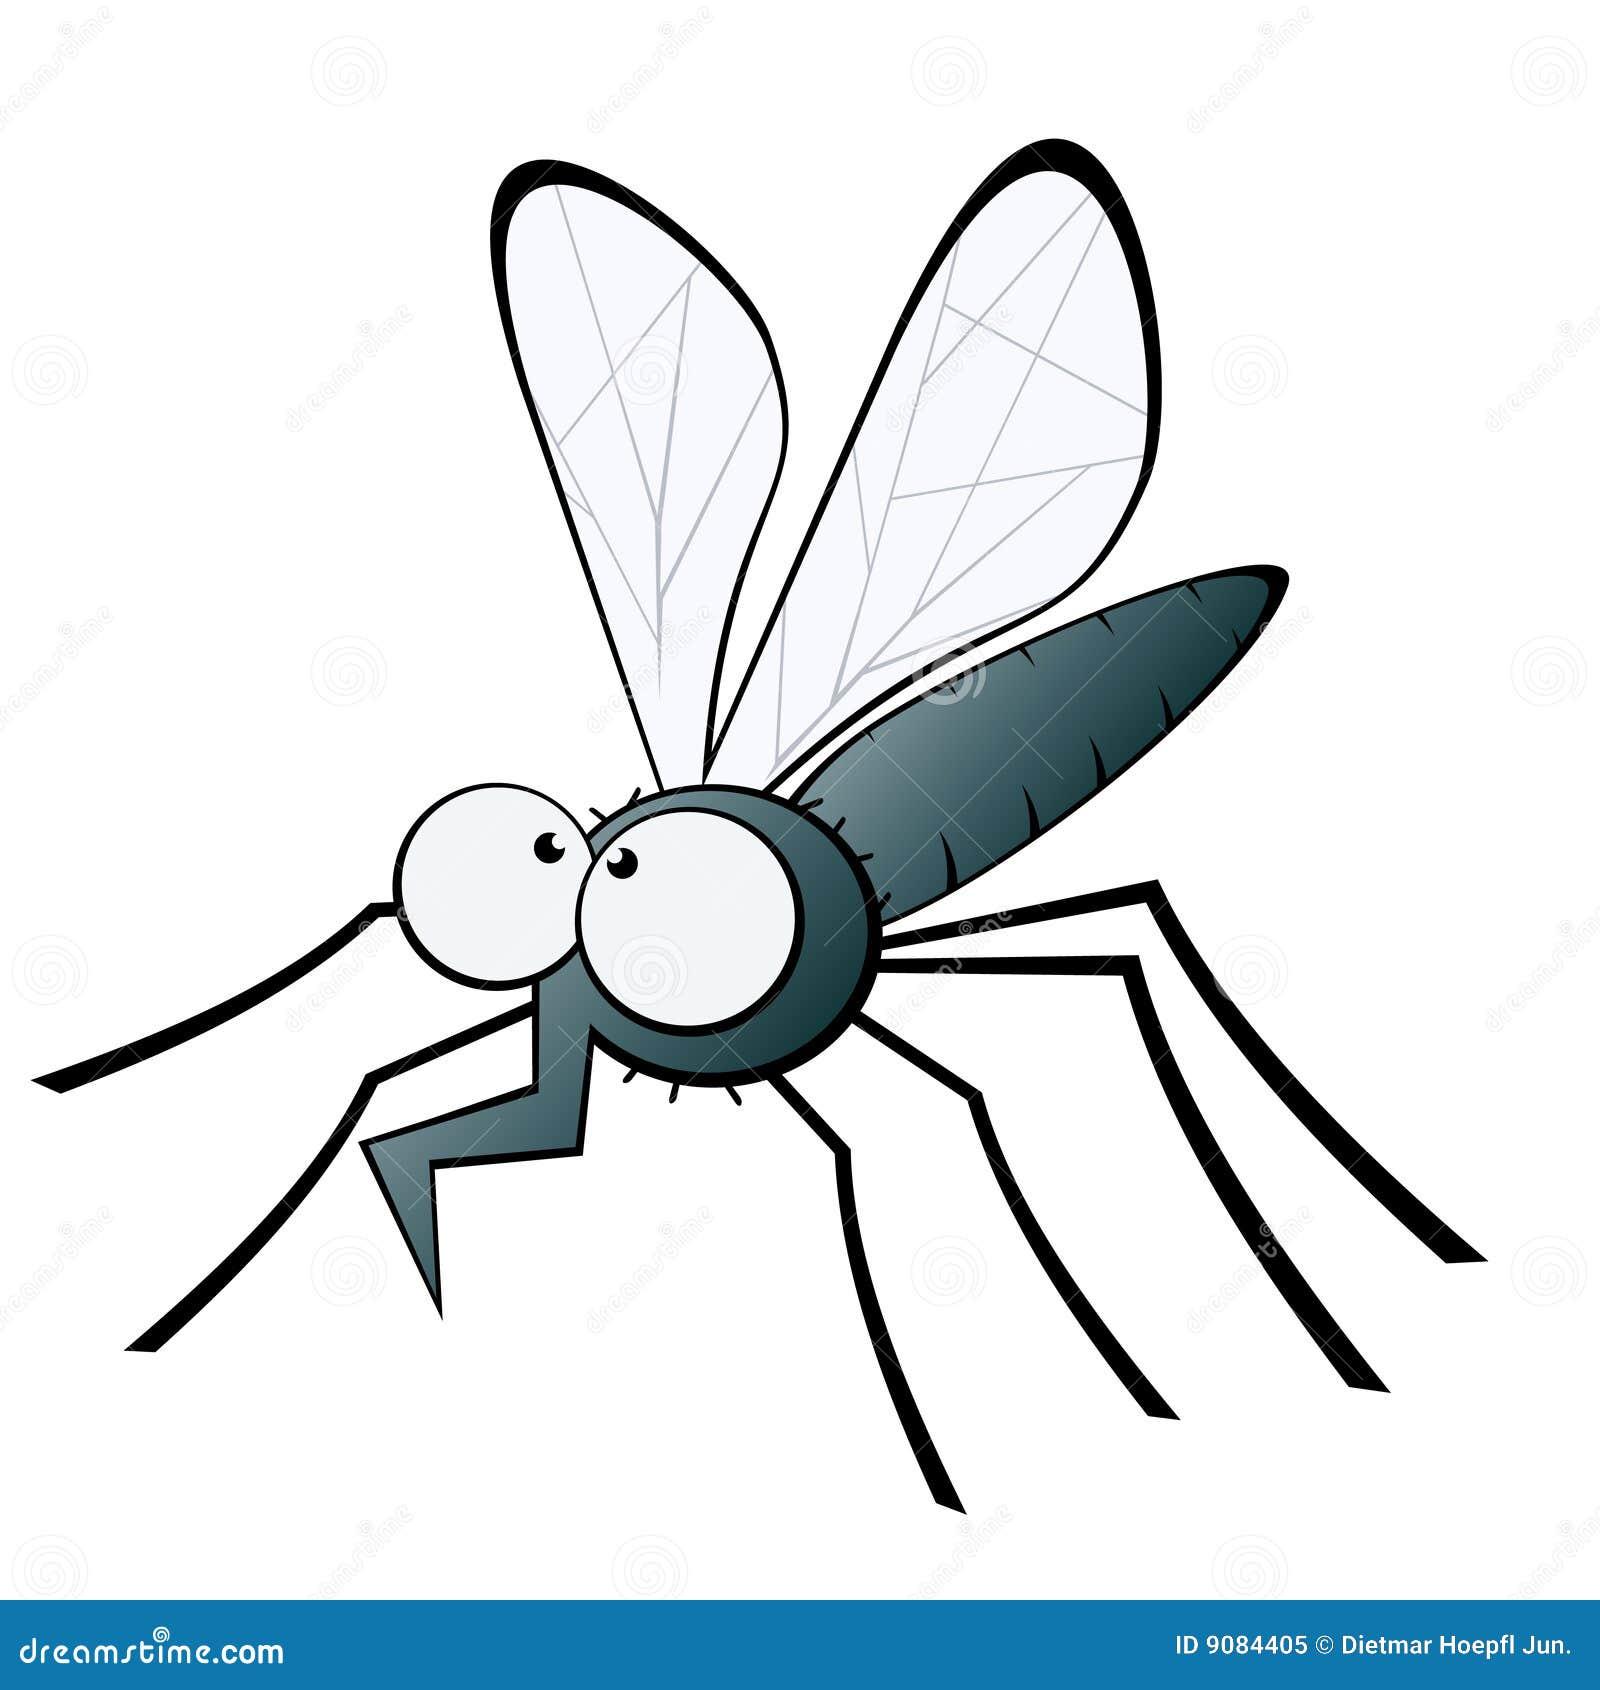 Moskito mit verbogener Proboscis